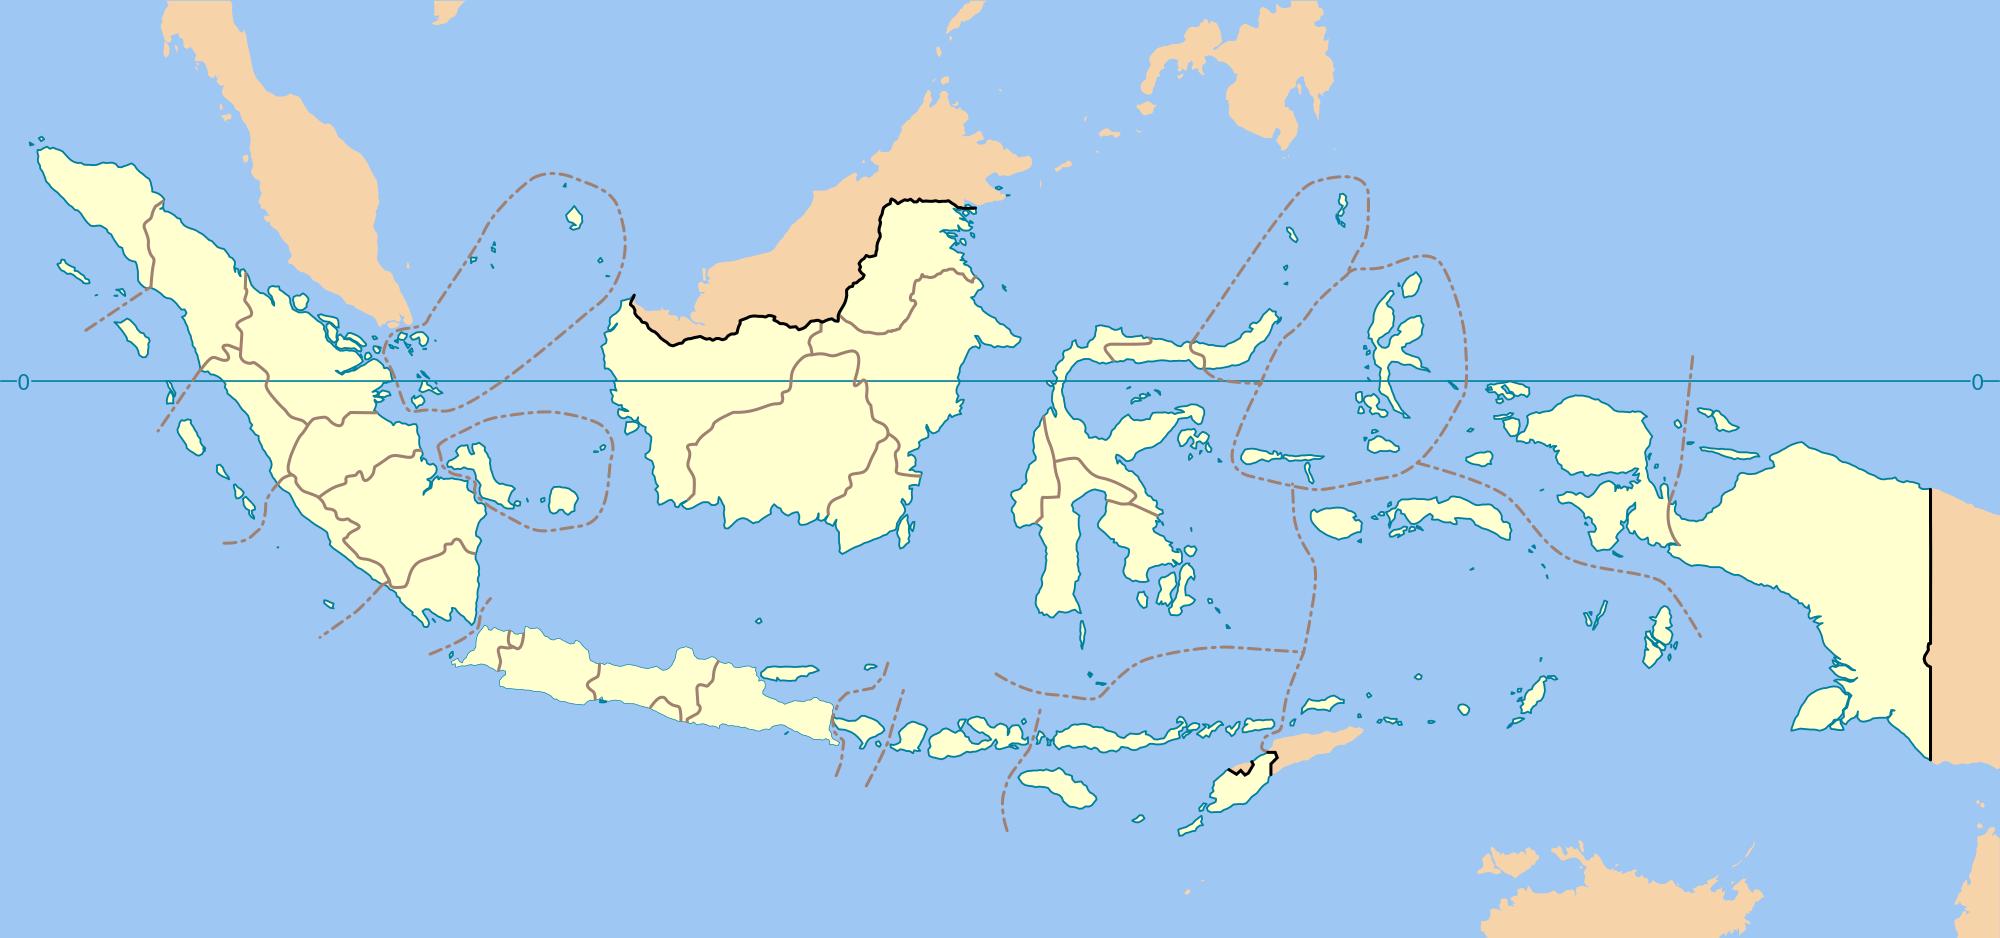 Daftar Gua Maria Indonesia Wikipedia Bahasa Provinces Blank Map Svg